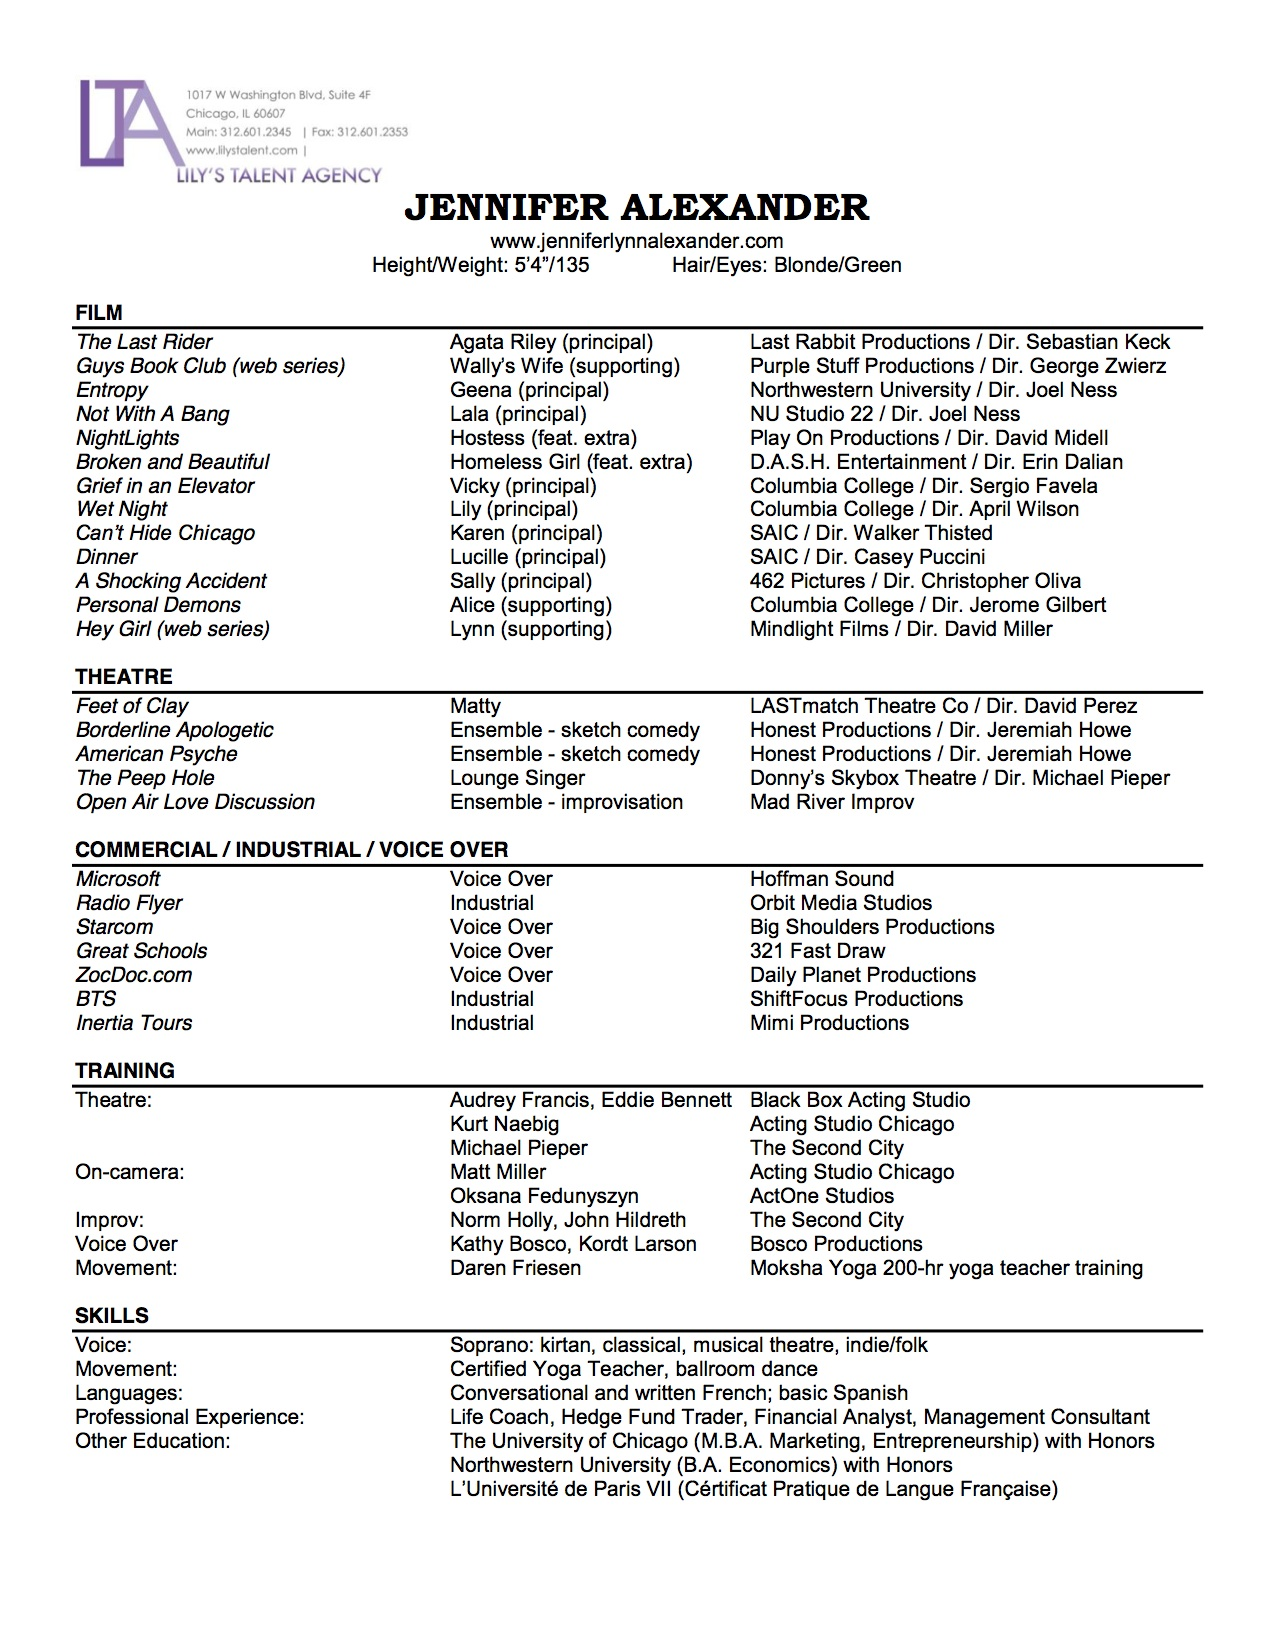 Resume Jennifer Alexander Actress Voice Artist .